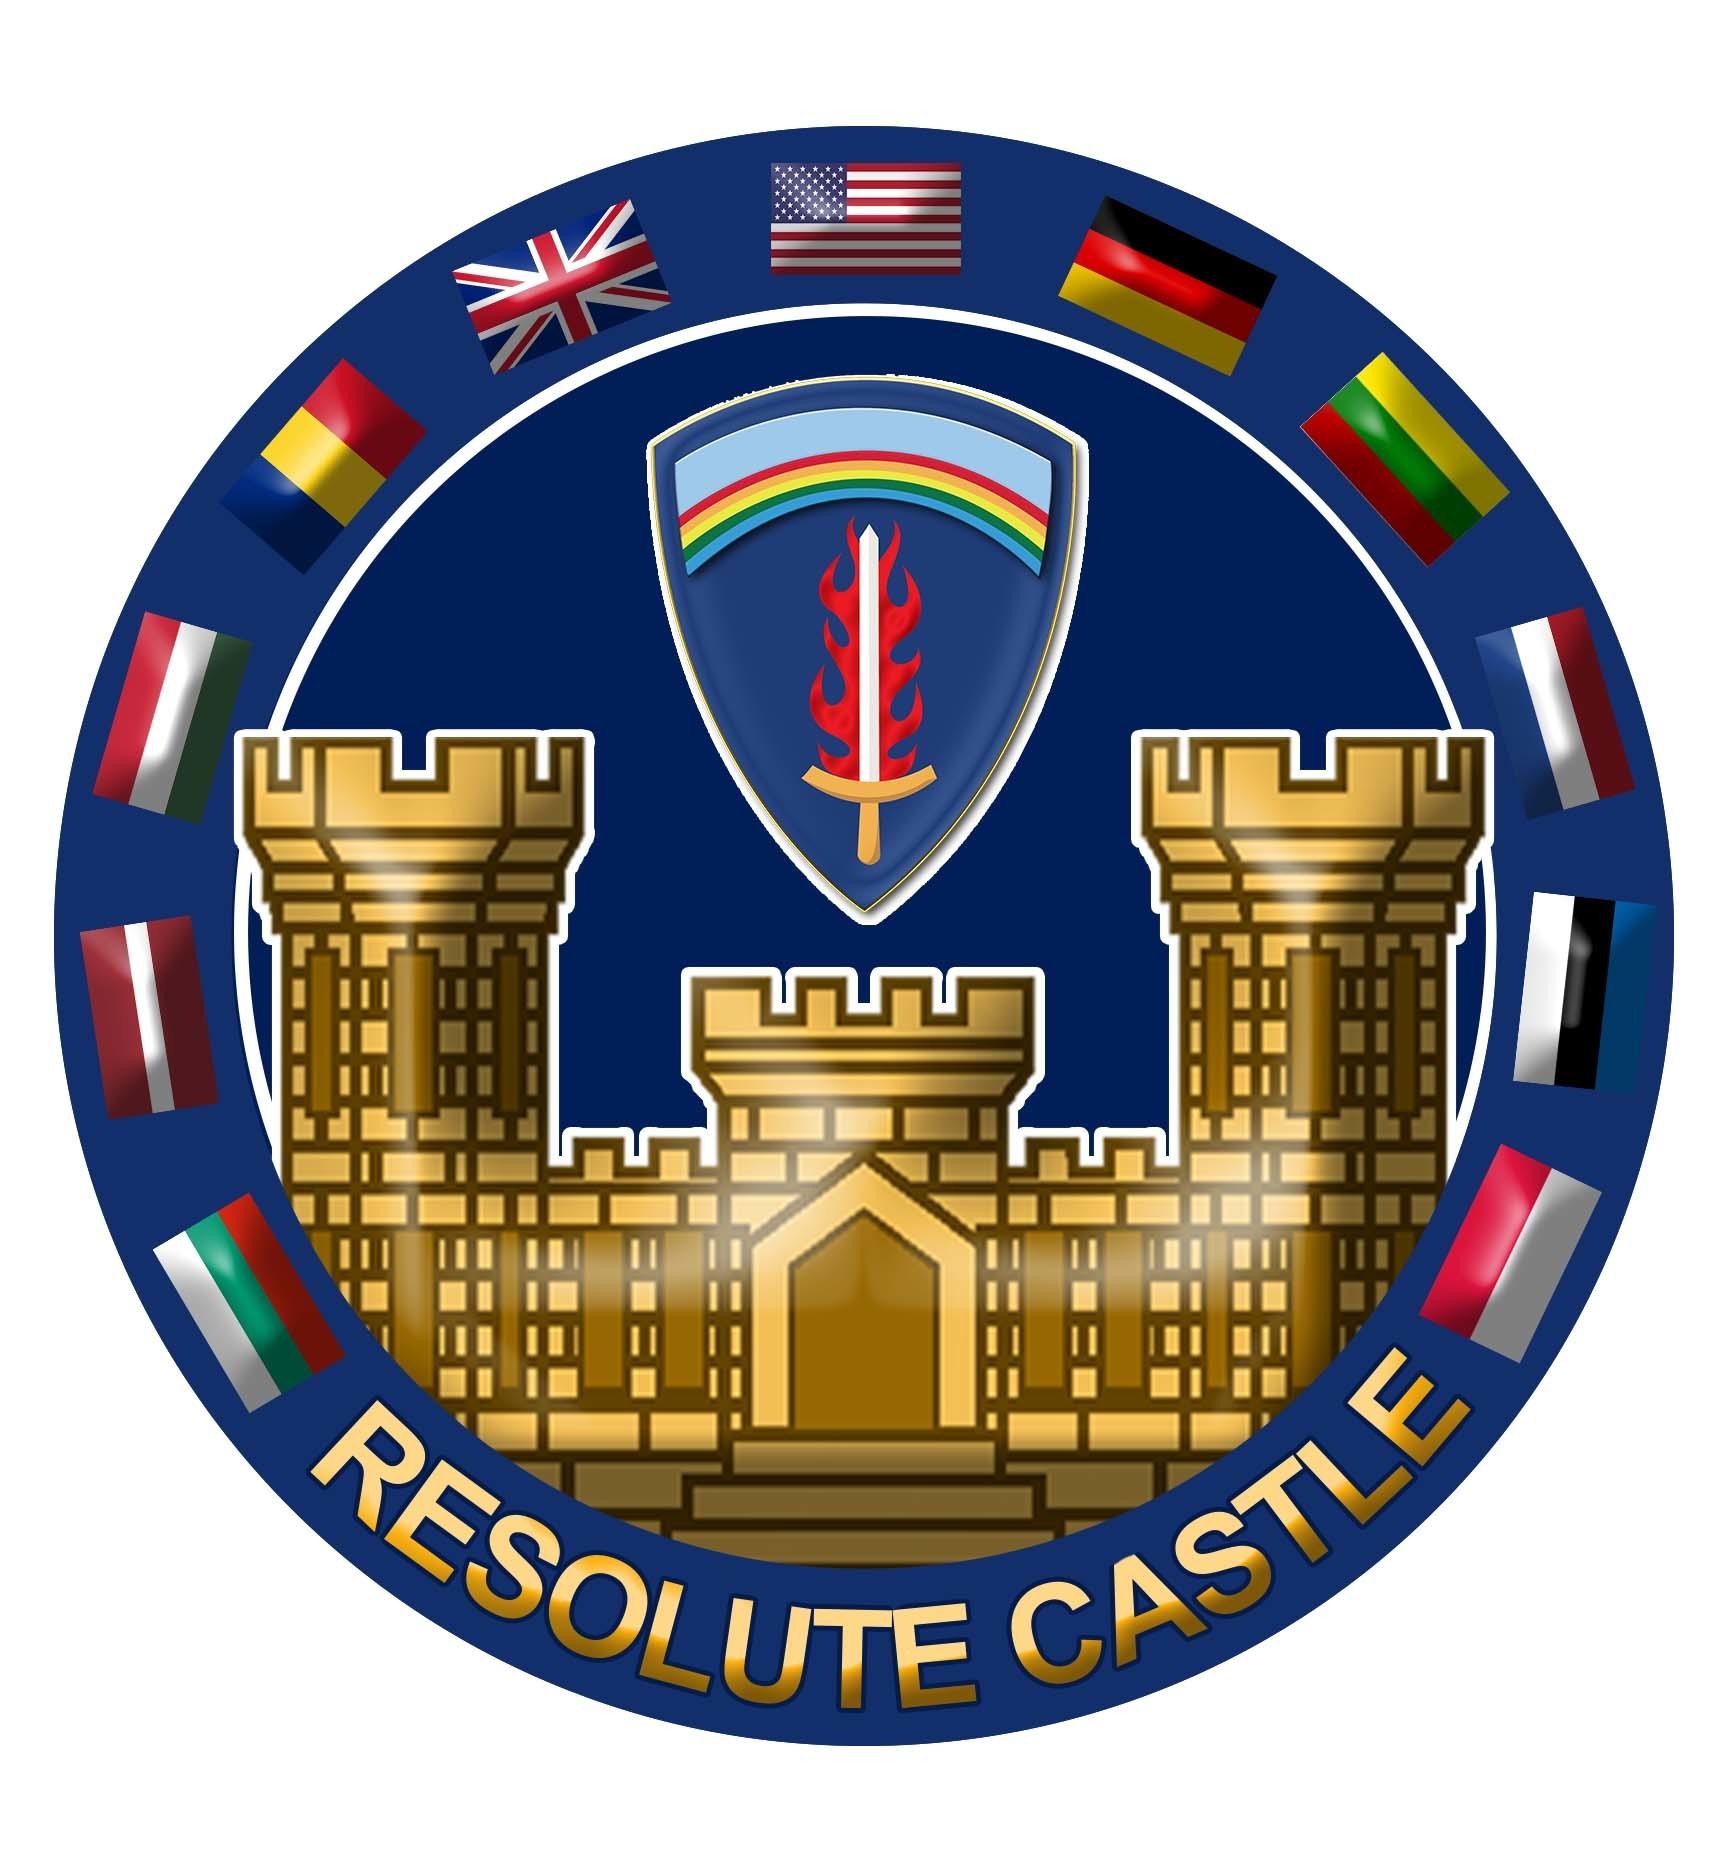 Resolute Castle - Logo Design